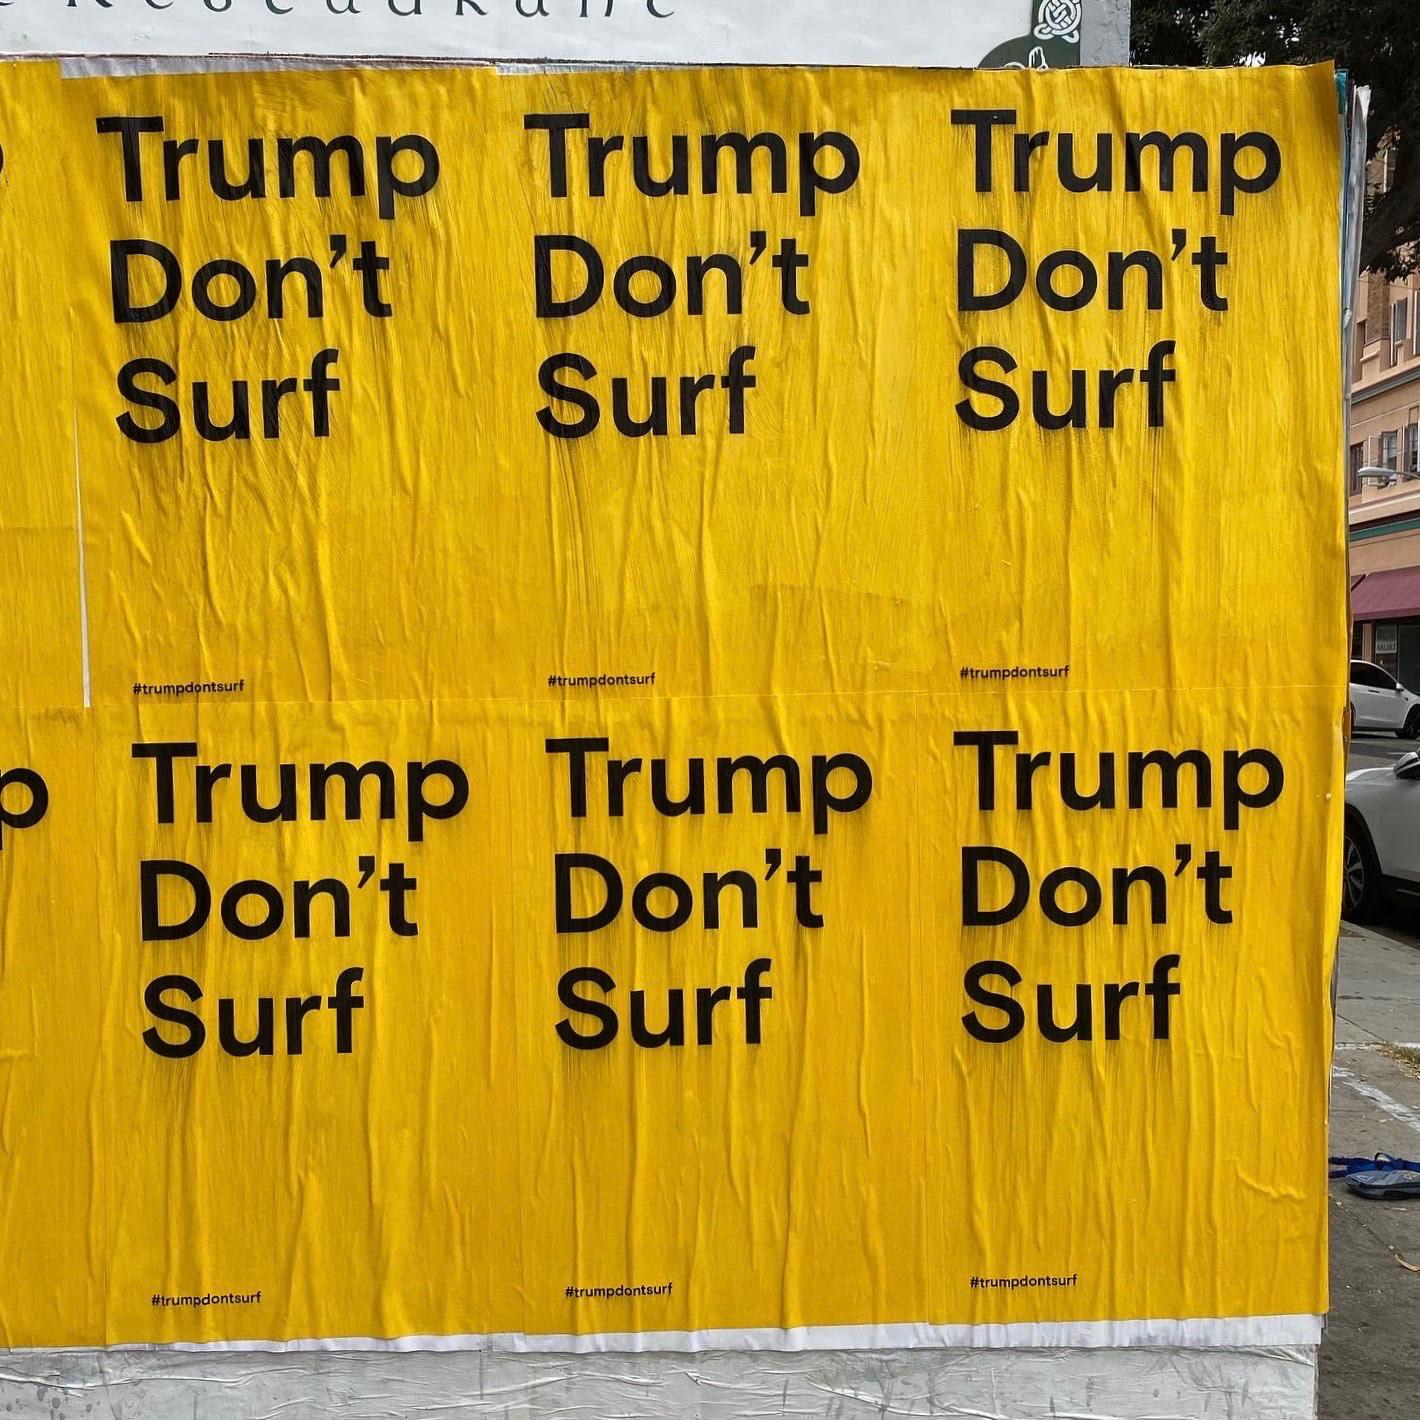 Trump Don't Surf